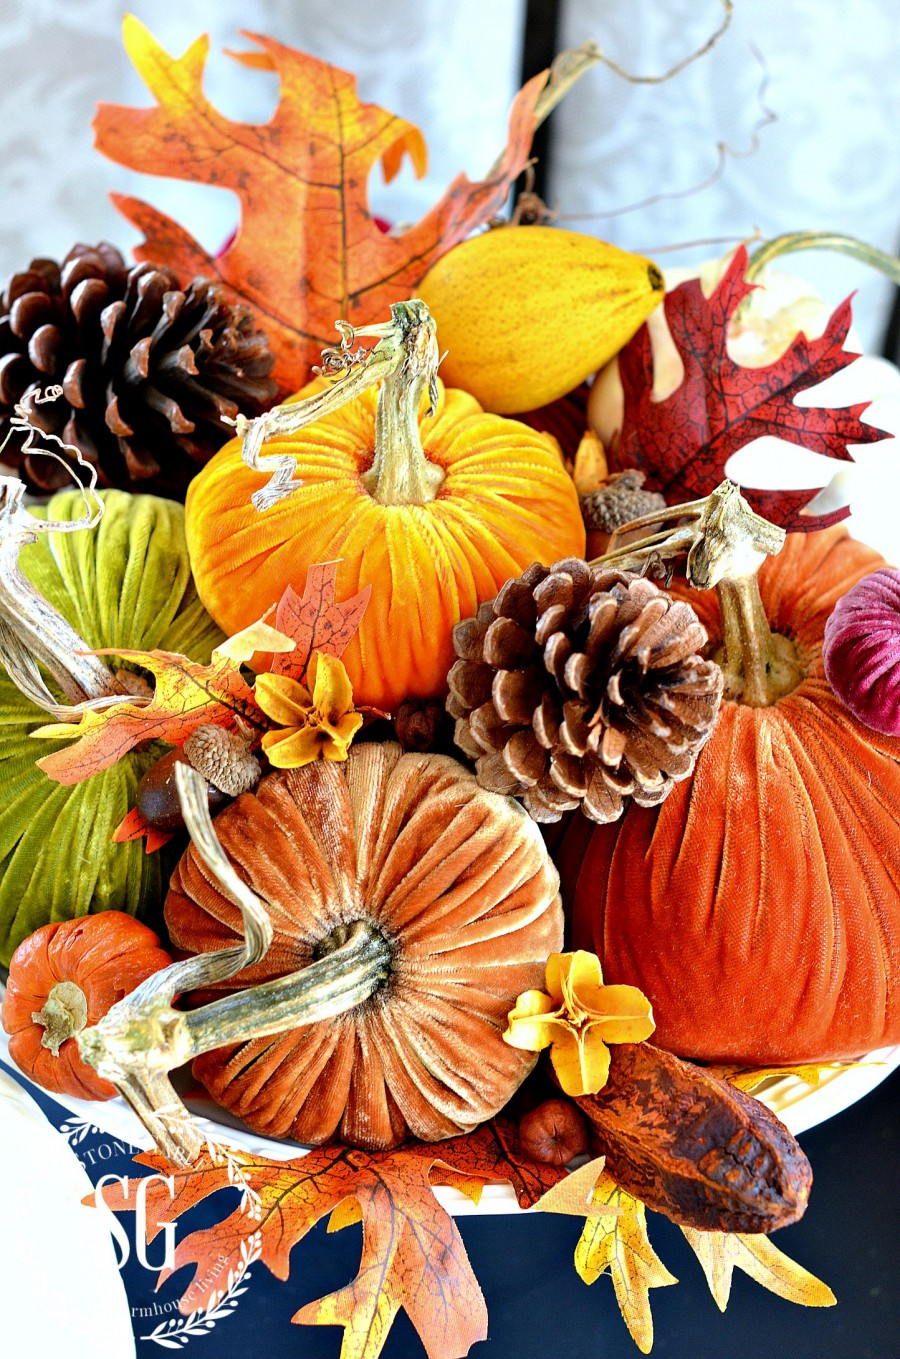 5 BEAUTIFUL WAYS TO STYLE PUMPKINS-1-pumpkins-on-pedestal-cake-plate- stonegableblog.com